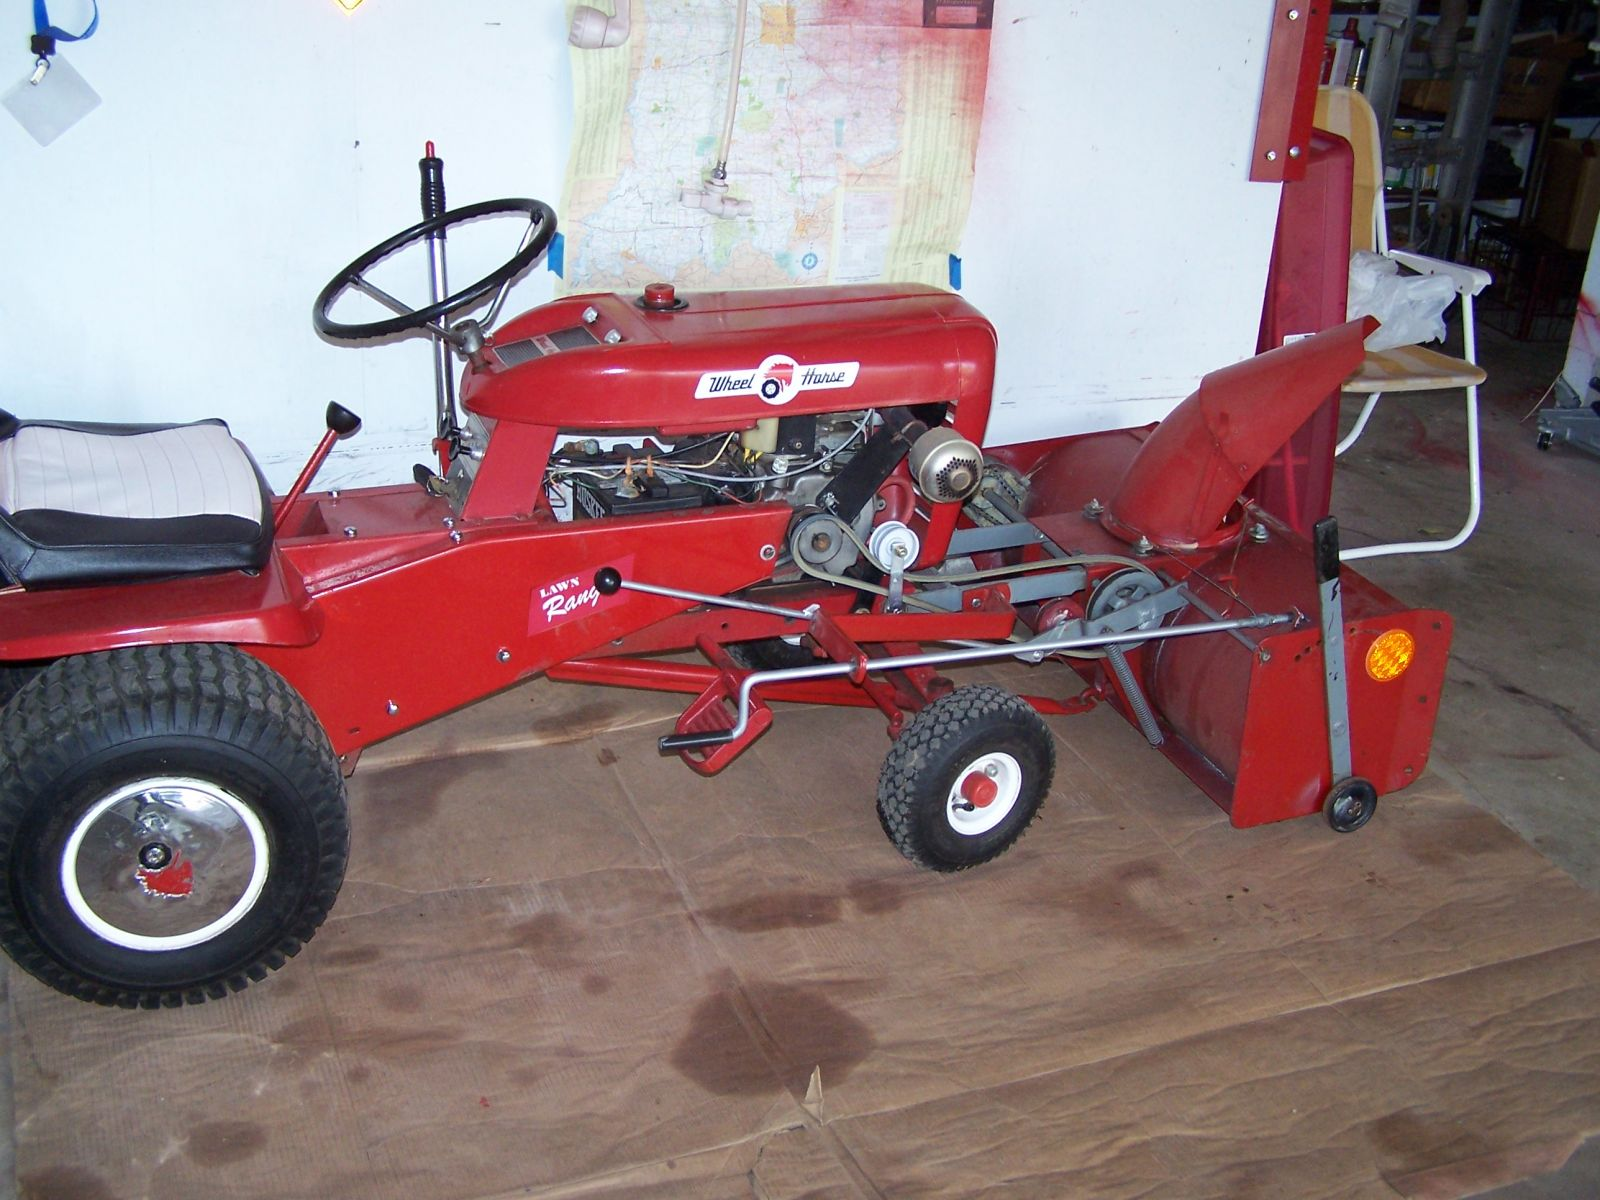 1967 Wheel Horse Lawn Ranger , L-157 tractor